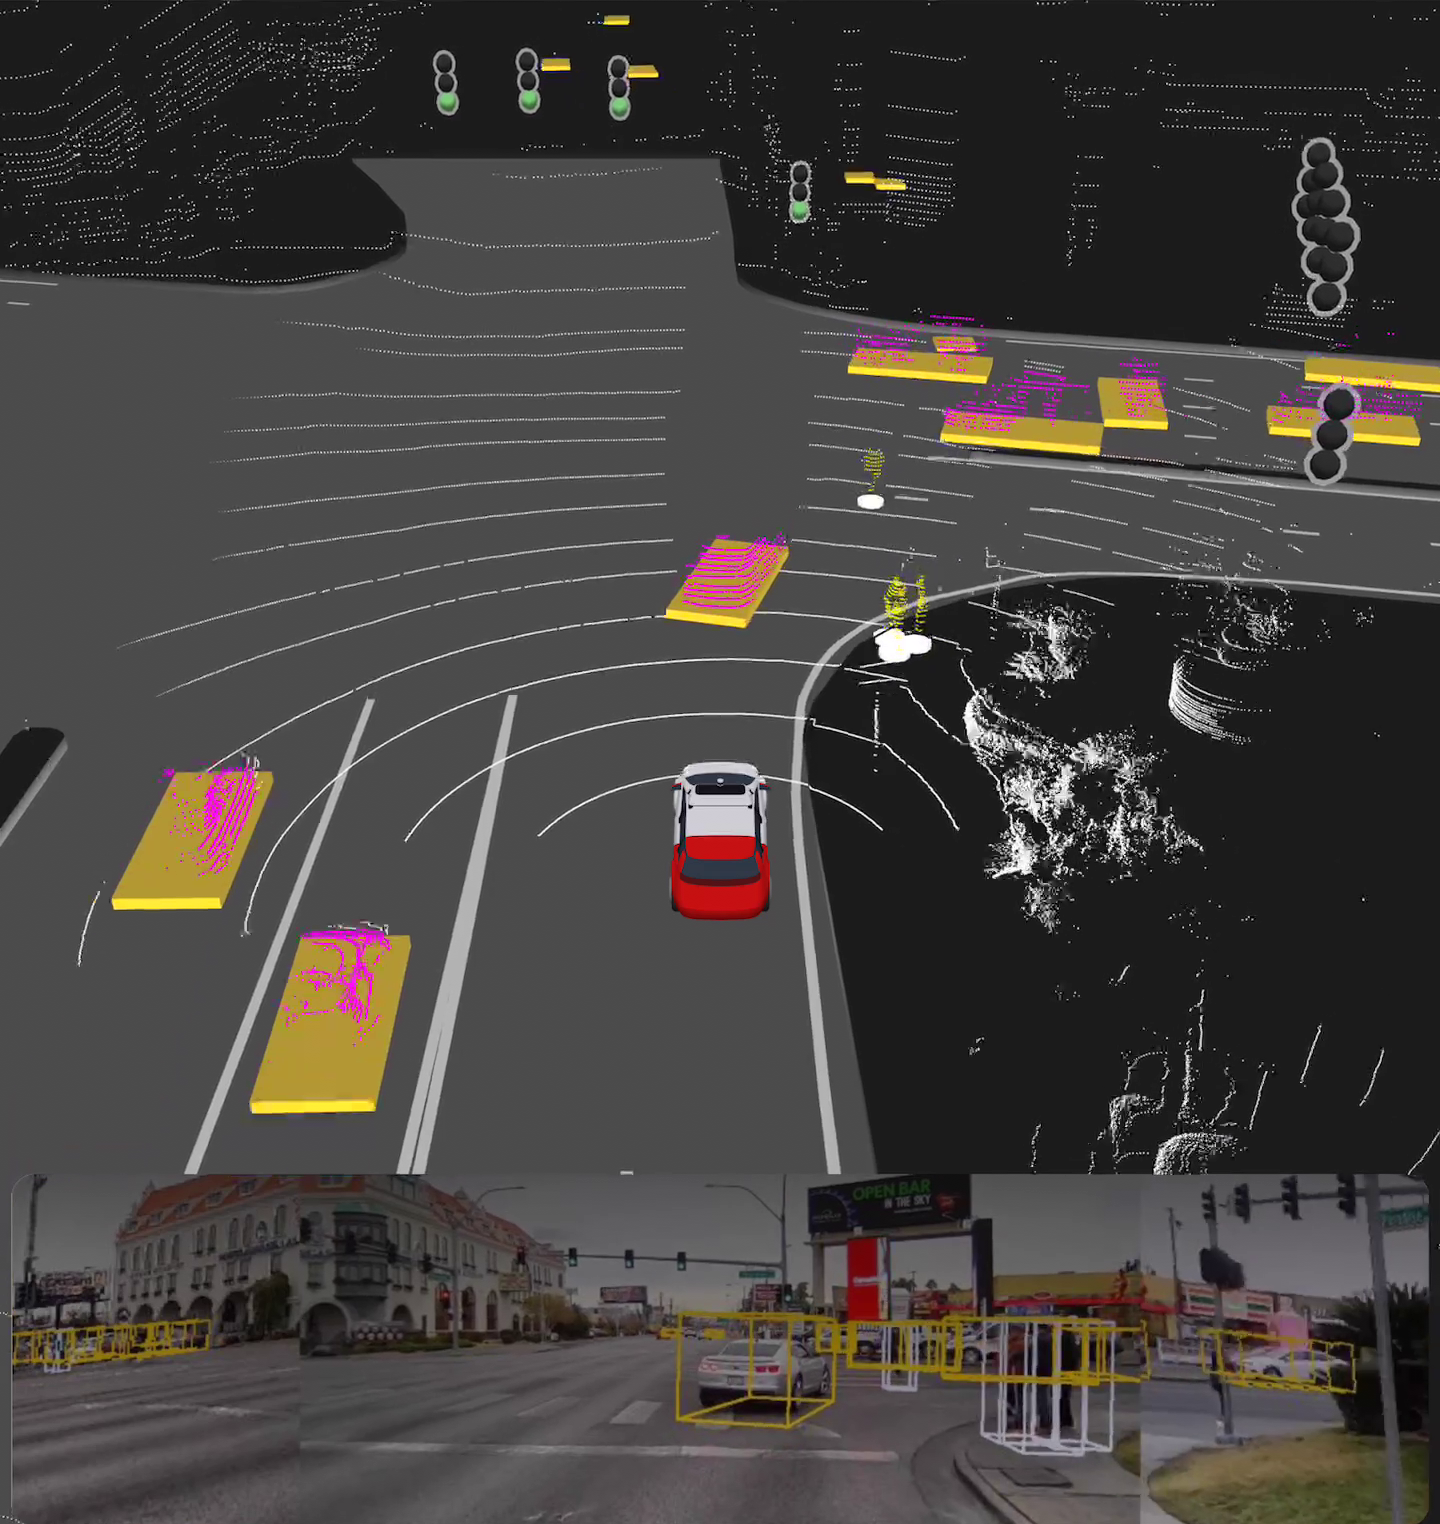 Yandex — Company blog — Yandex Self-Driving Car Gives First